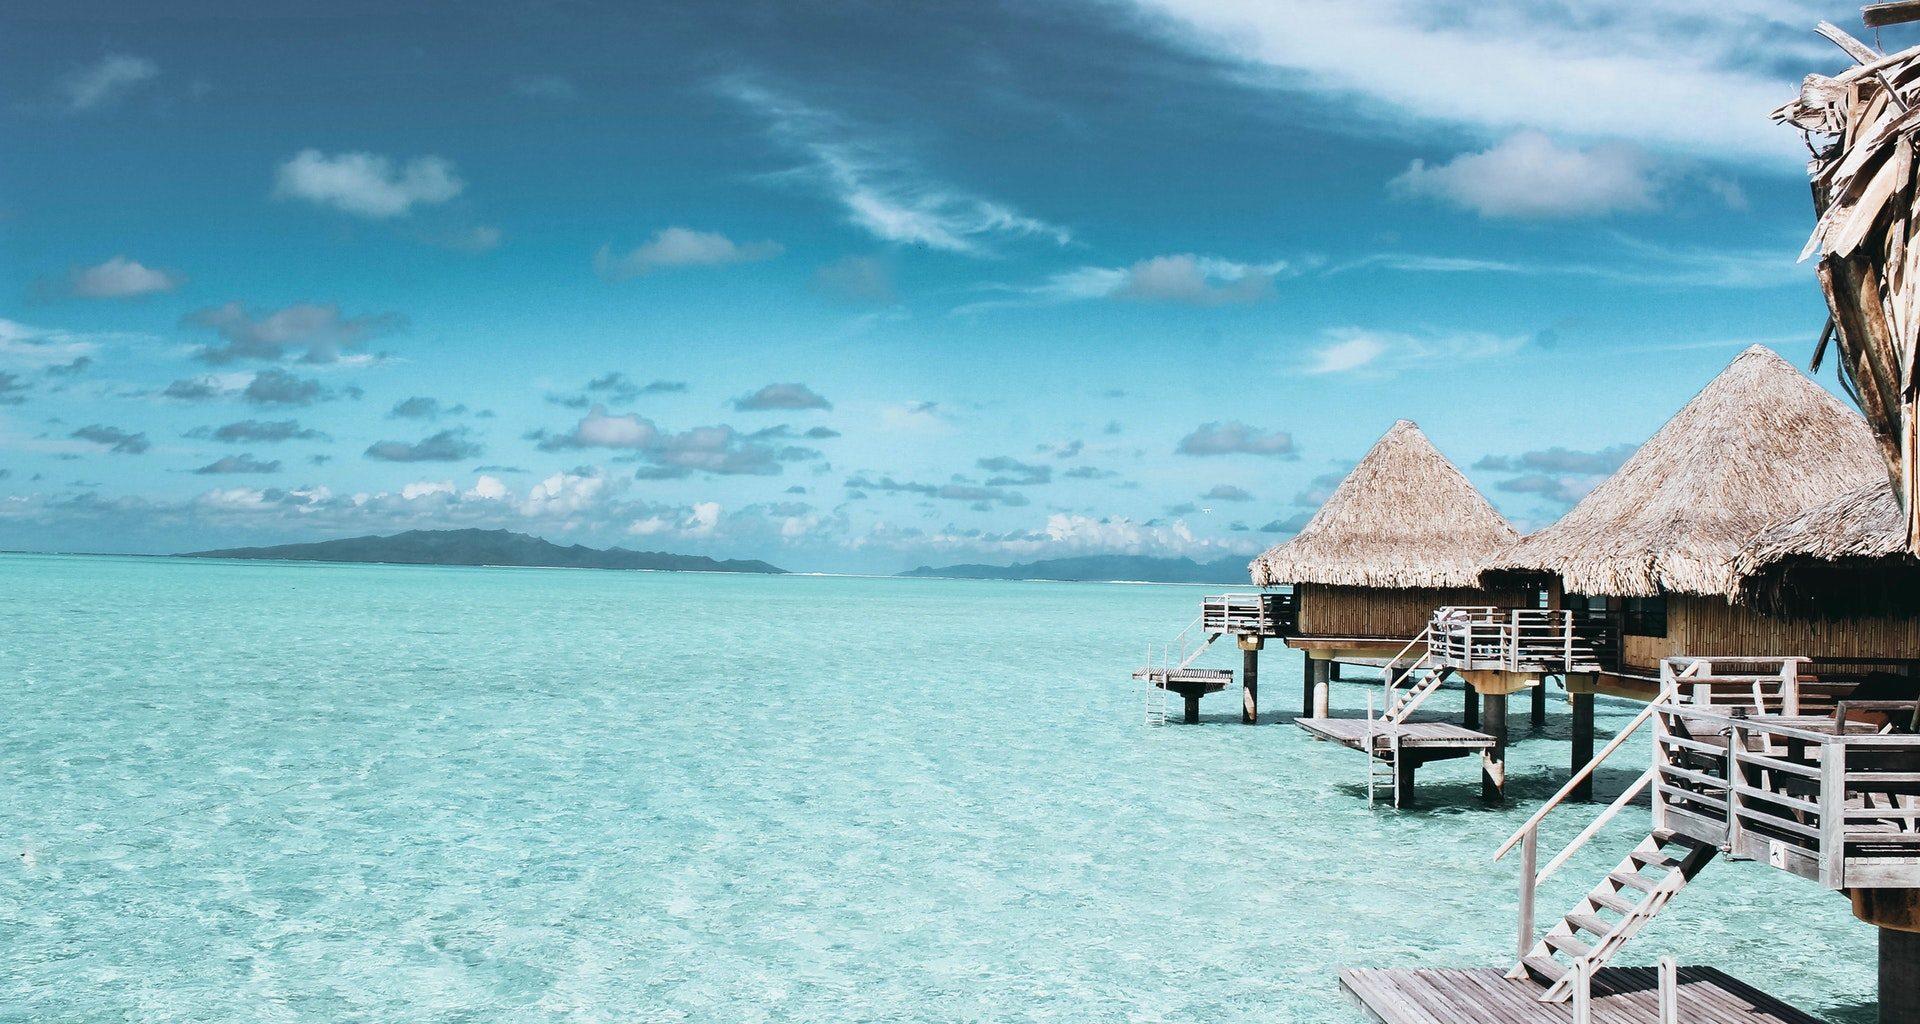 Best Destinations For A Honeymoon In November Honeymoon Goals